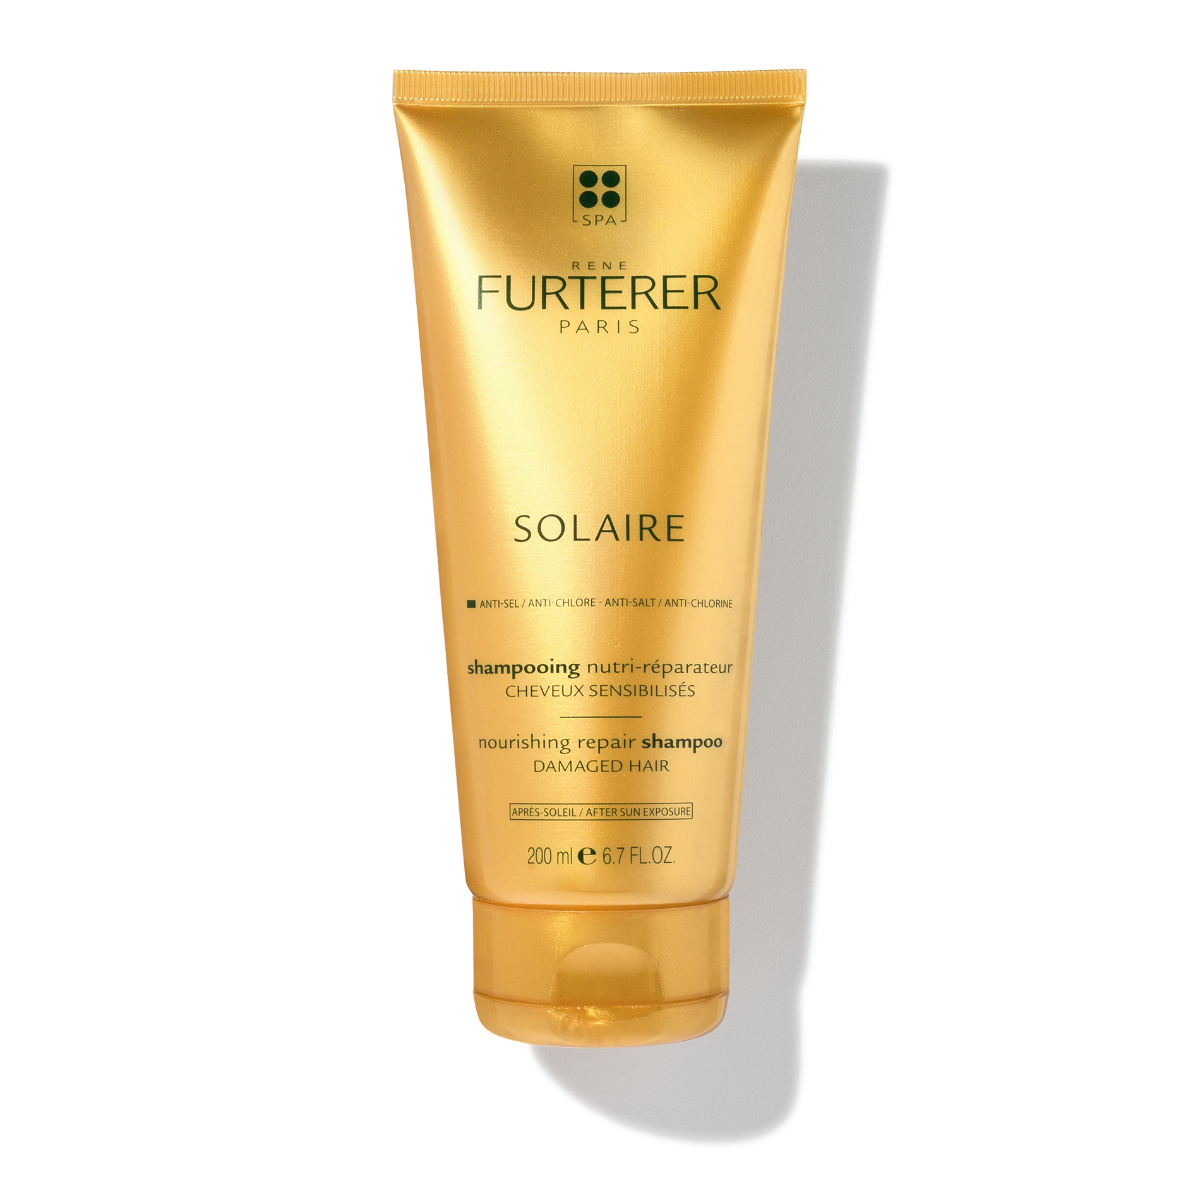 Rene Furterer SOLAIRE nourishing repair shampoo